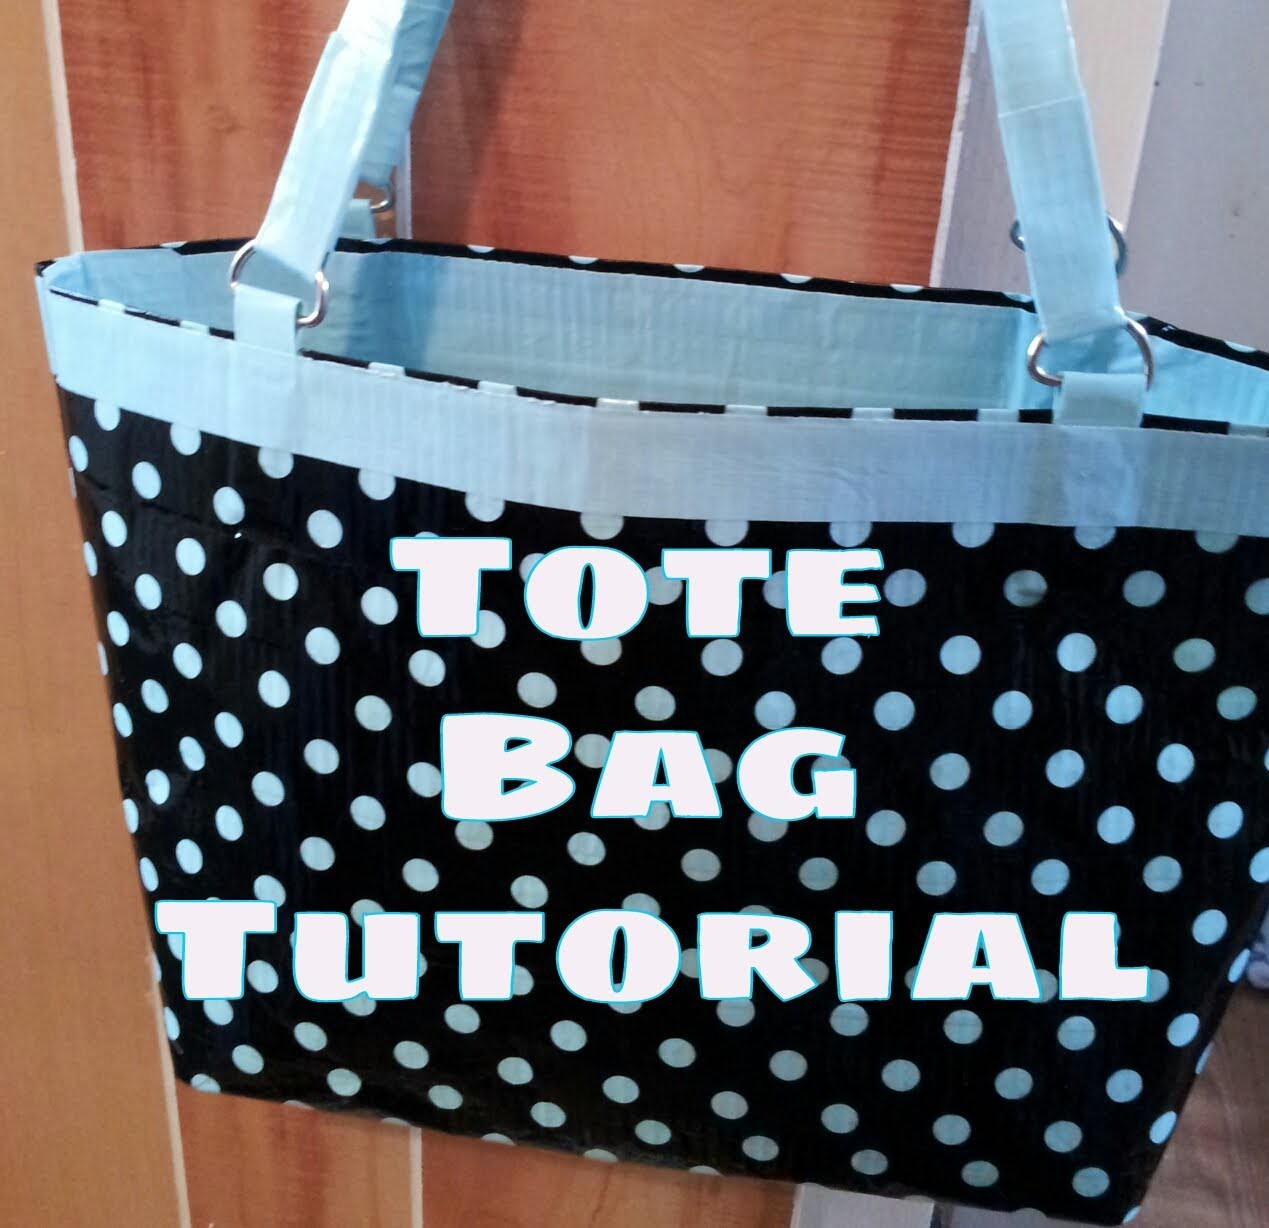 (DIY) Duct Tape Tote Bag Purse Tutorial!!! ( NO SEW)